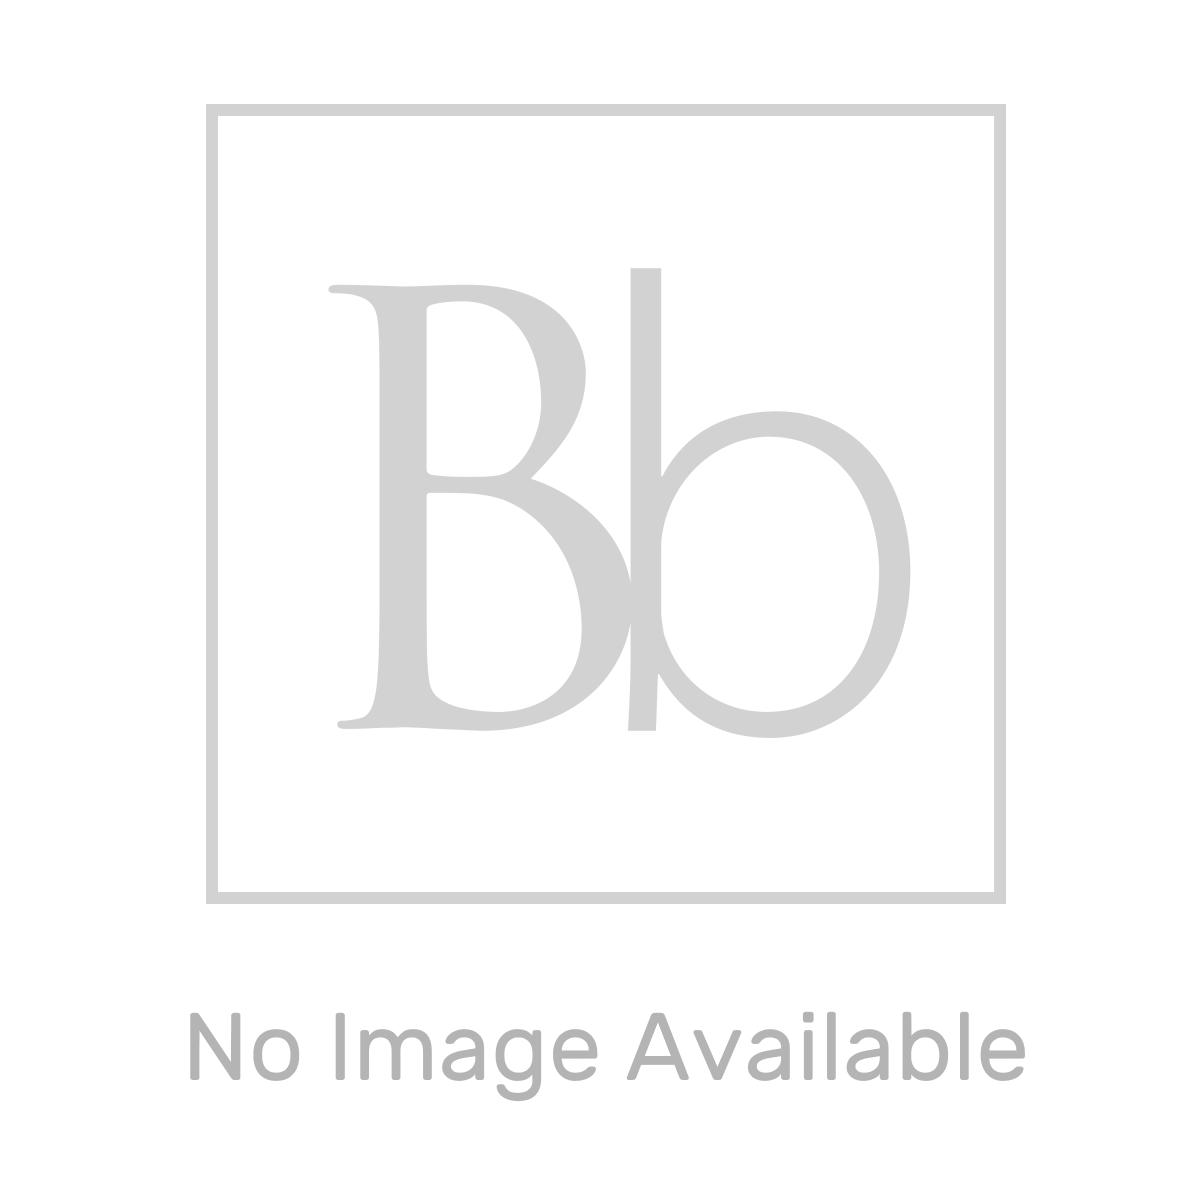 RAK Surface Mid Grey Lappato Tile 600 x 600mm Lifestyle